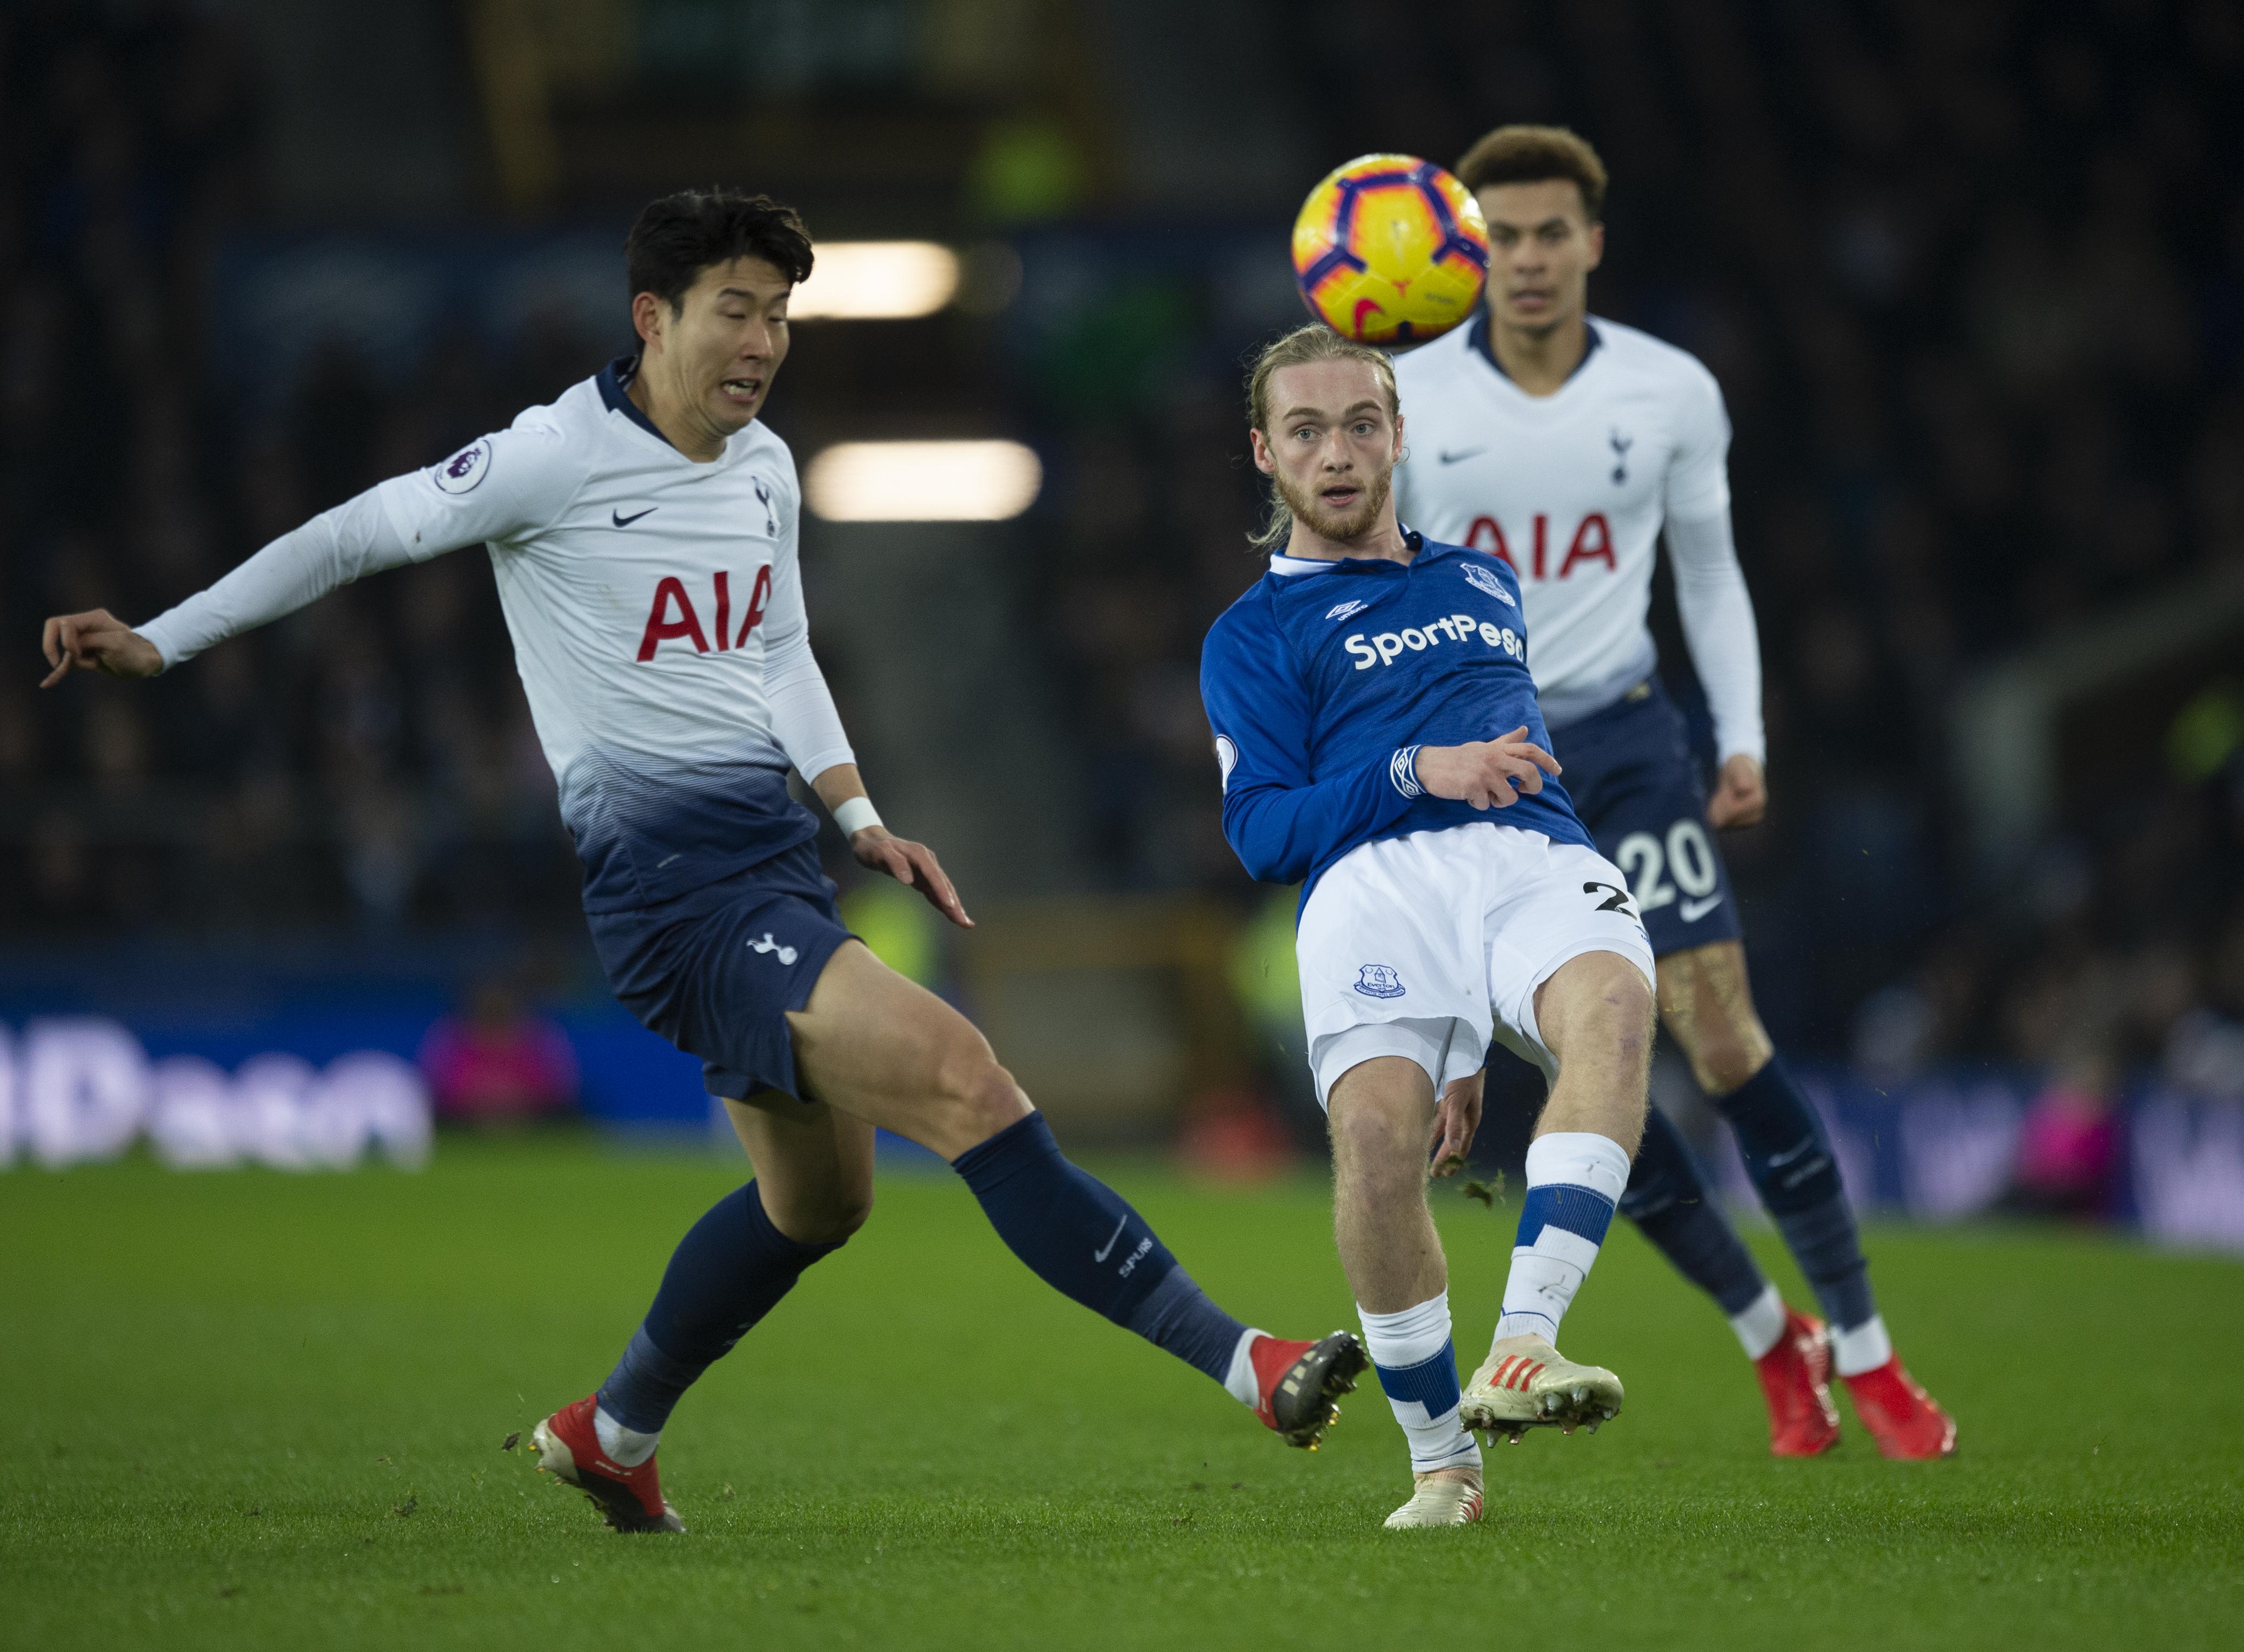 Everton's November fixture changes revealed